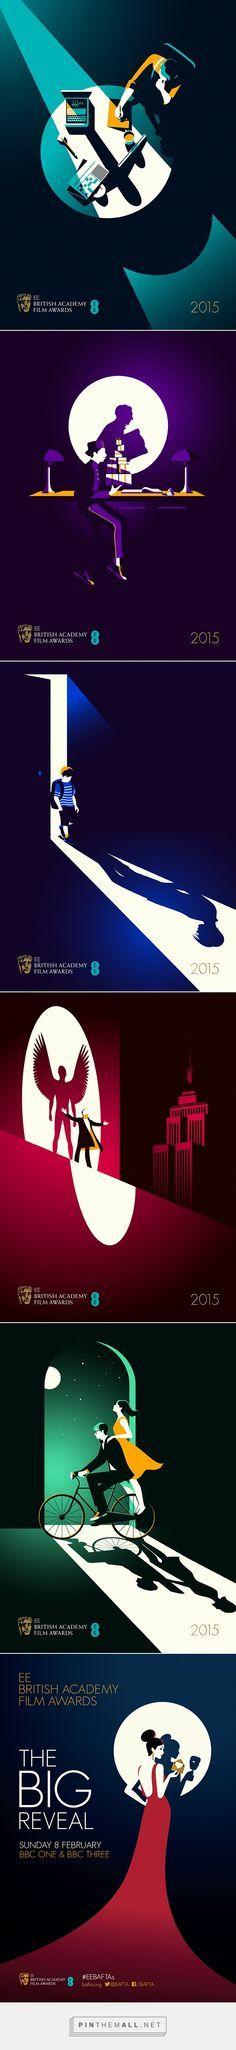 Malika Favre's terrific film noir-inspired posters for UK film's big night, the BAFTAs - created via http://pinthemall.net